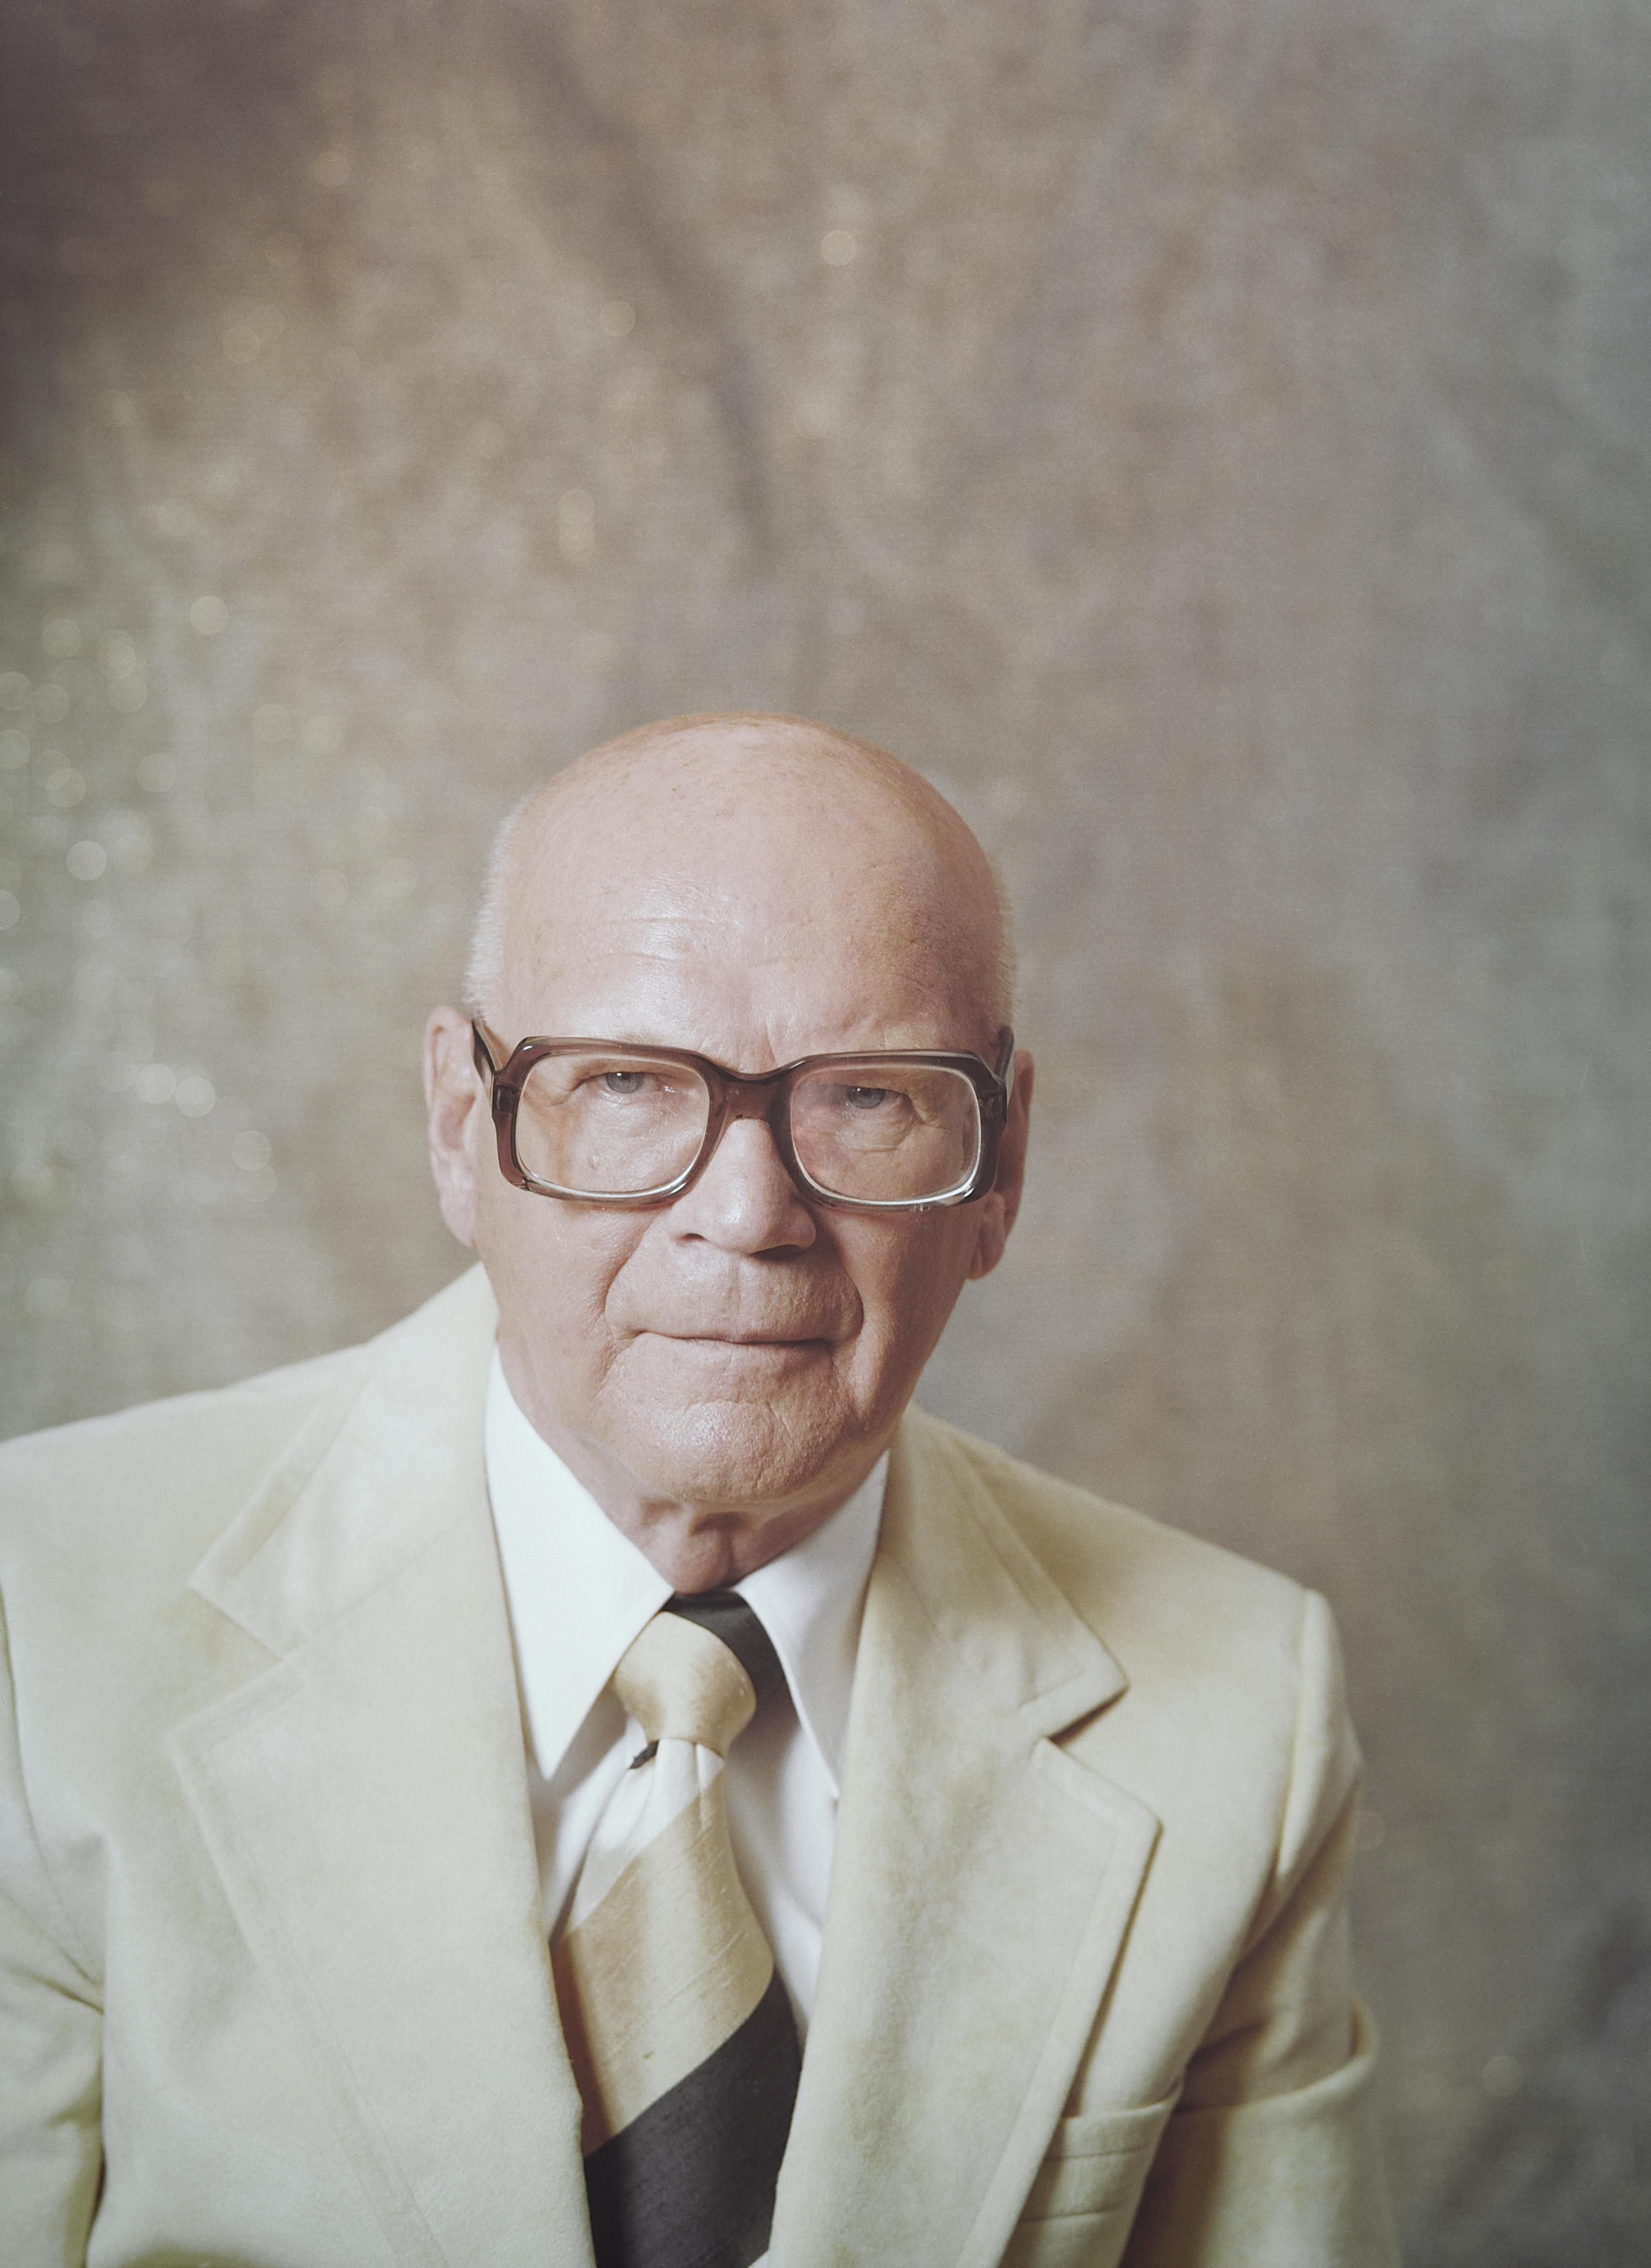 https://upload.wikimedia.org/wikipedia/commons/e/e0/Urho-Kekkonen-1977.jpg